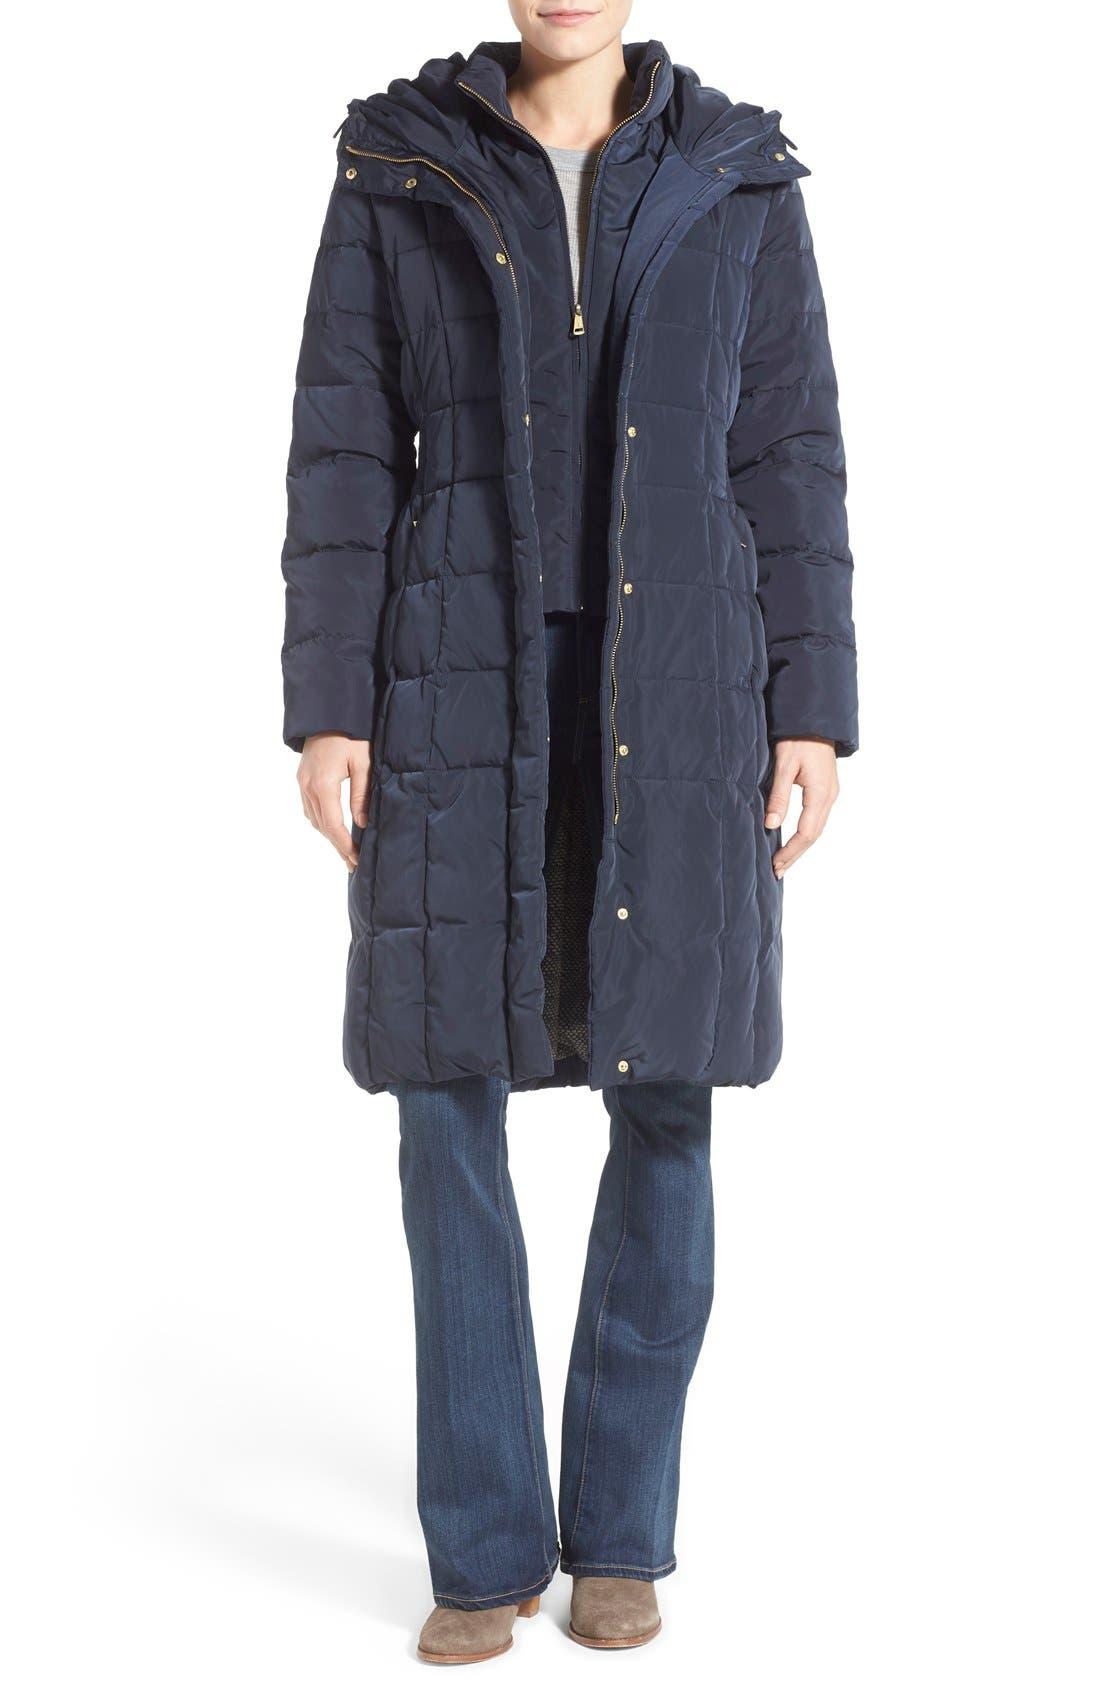 Alternate Image 1 Selected - Cole Haan Bib Insert Down & Feather Fill Coat (Regular & Petite)